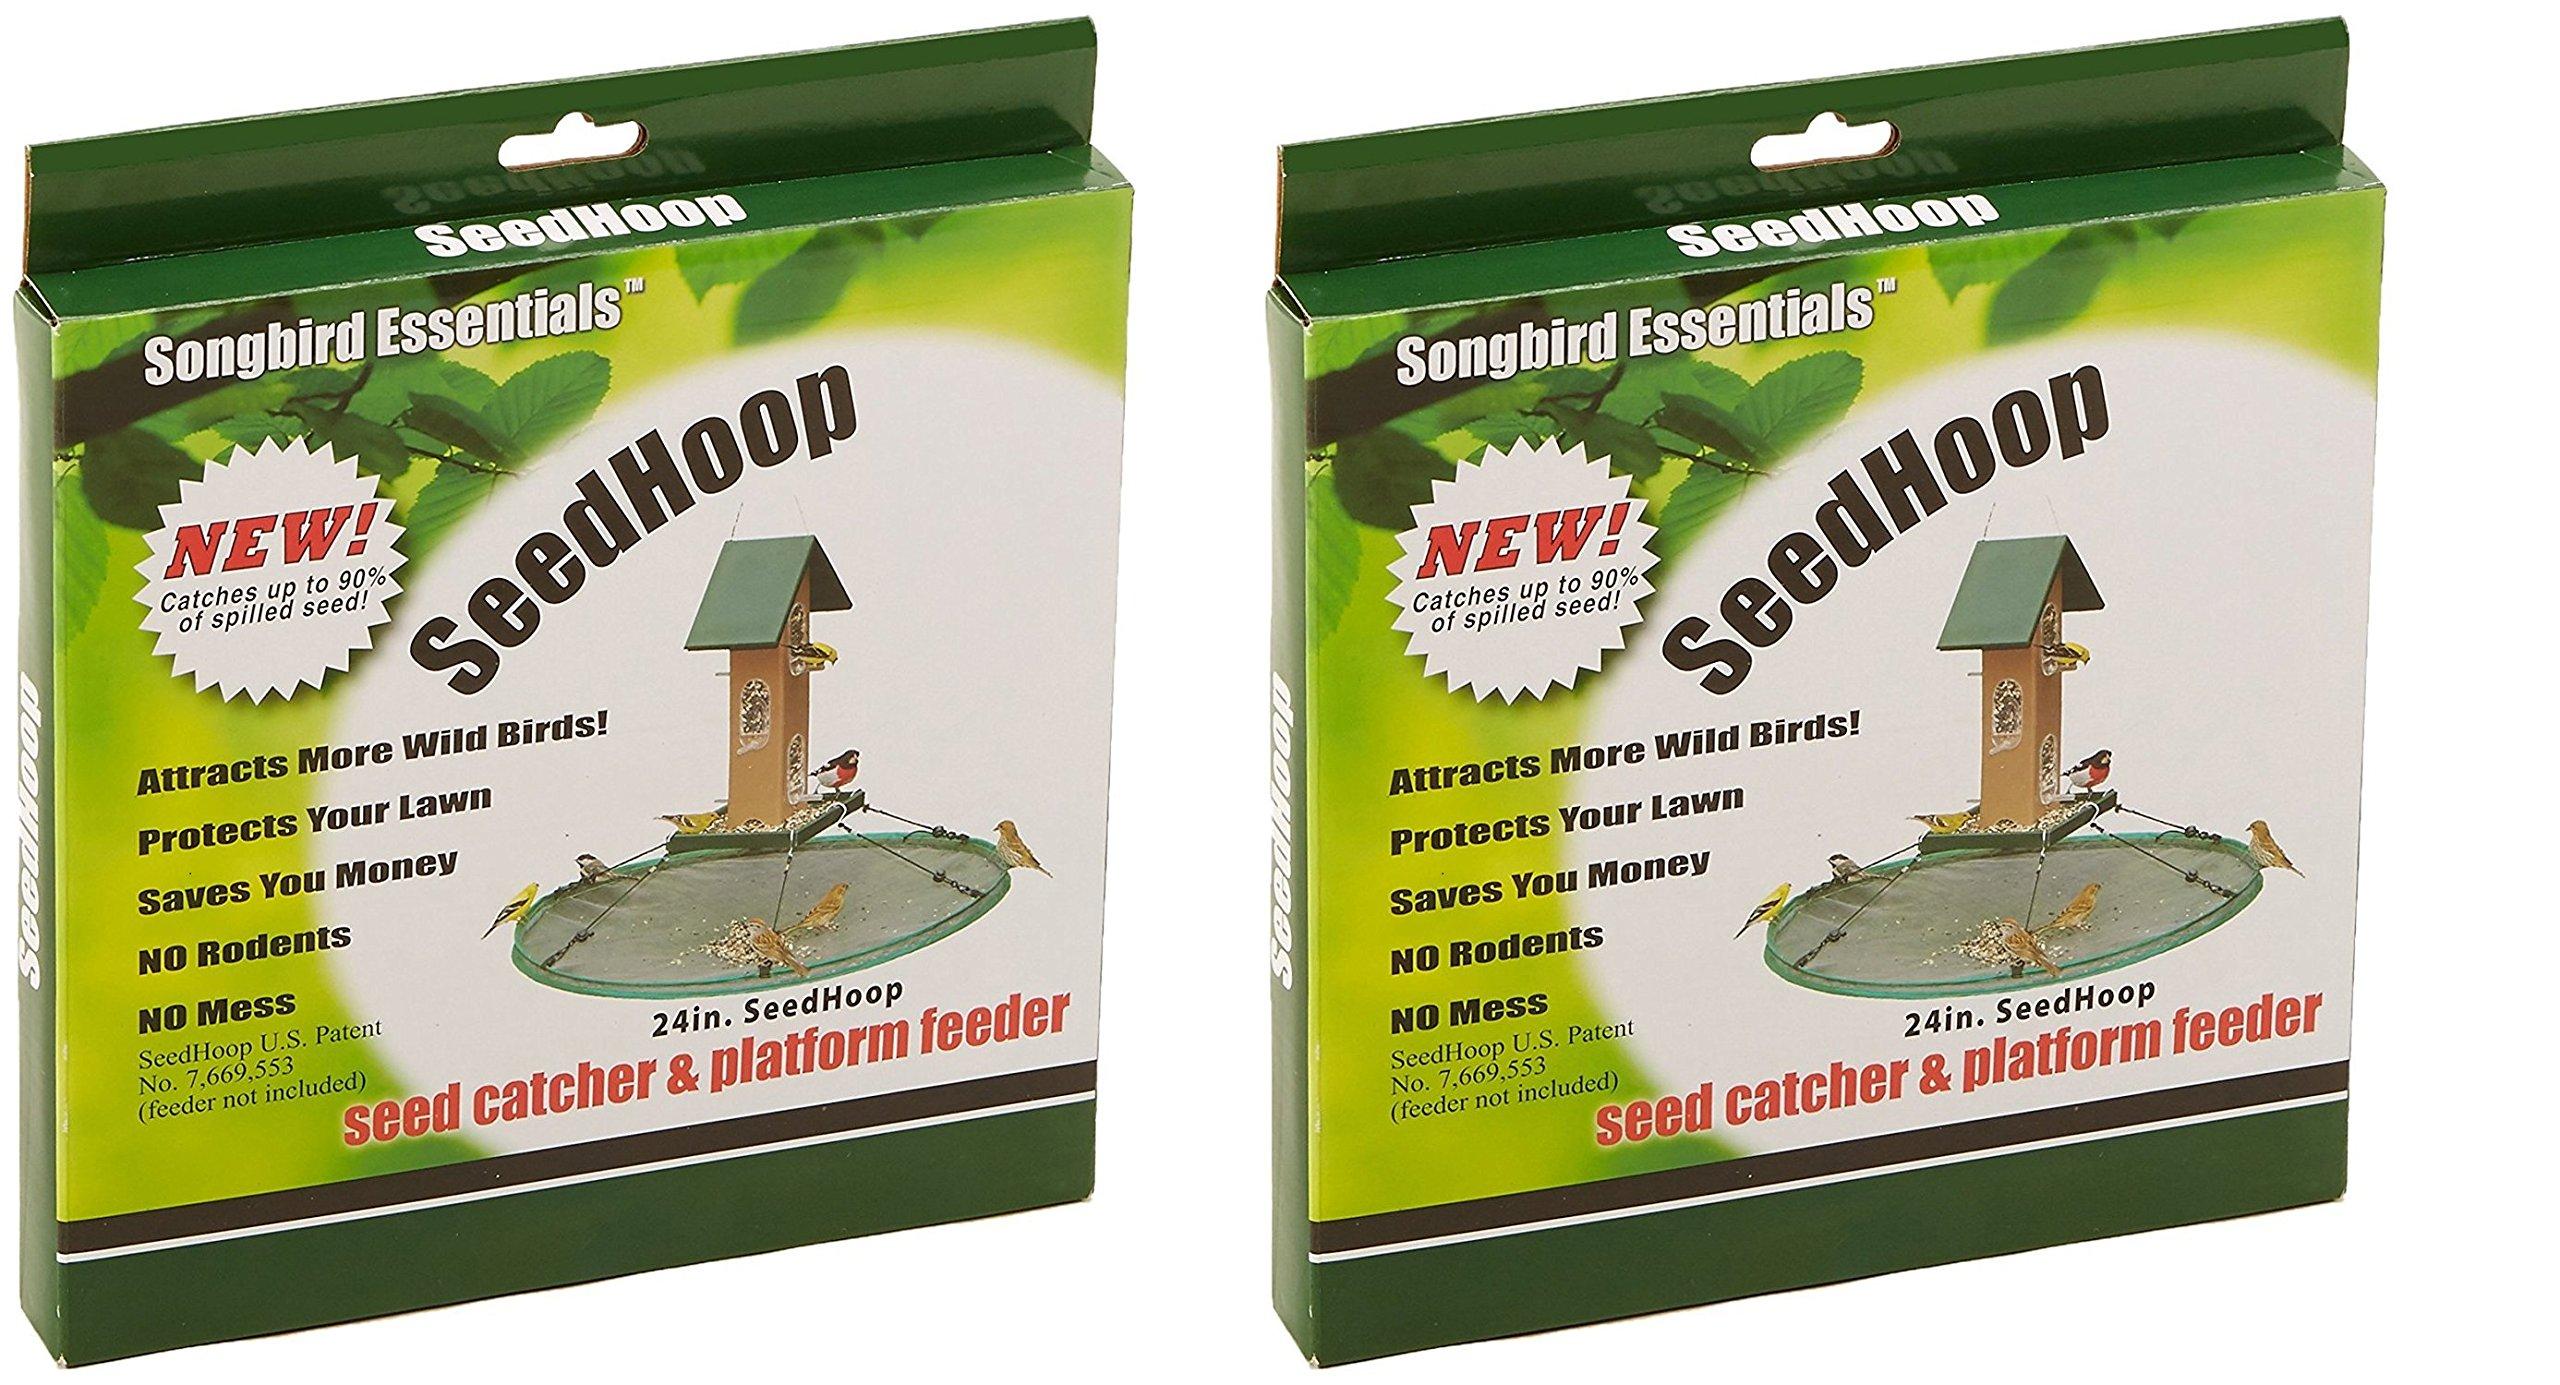 Songbird Essentials SEIA30024 Seed Hoop Seed Catcher & Platform Feeder (Pack of 2)